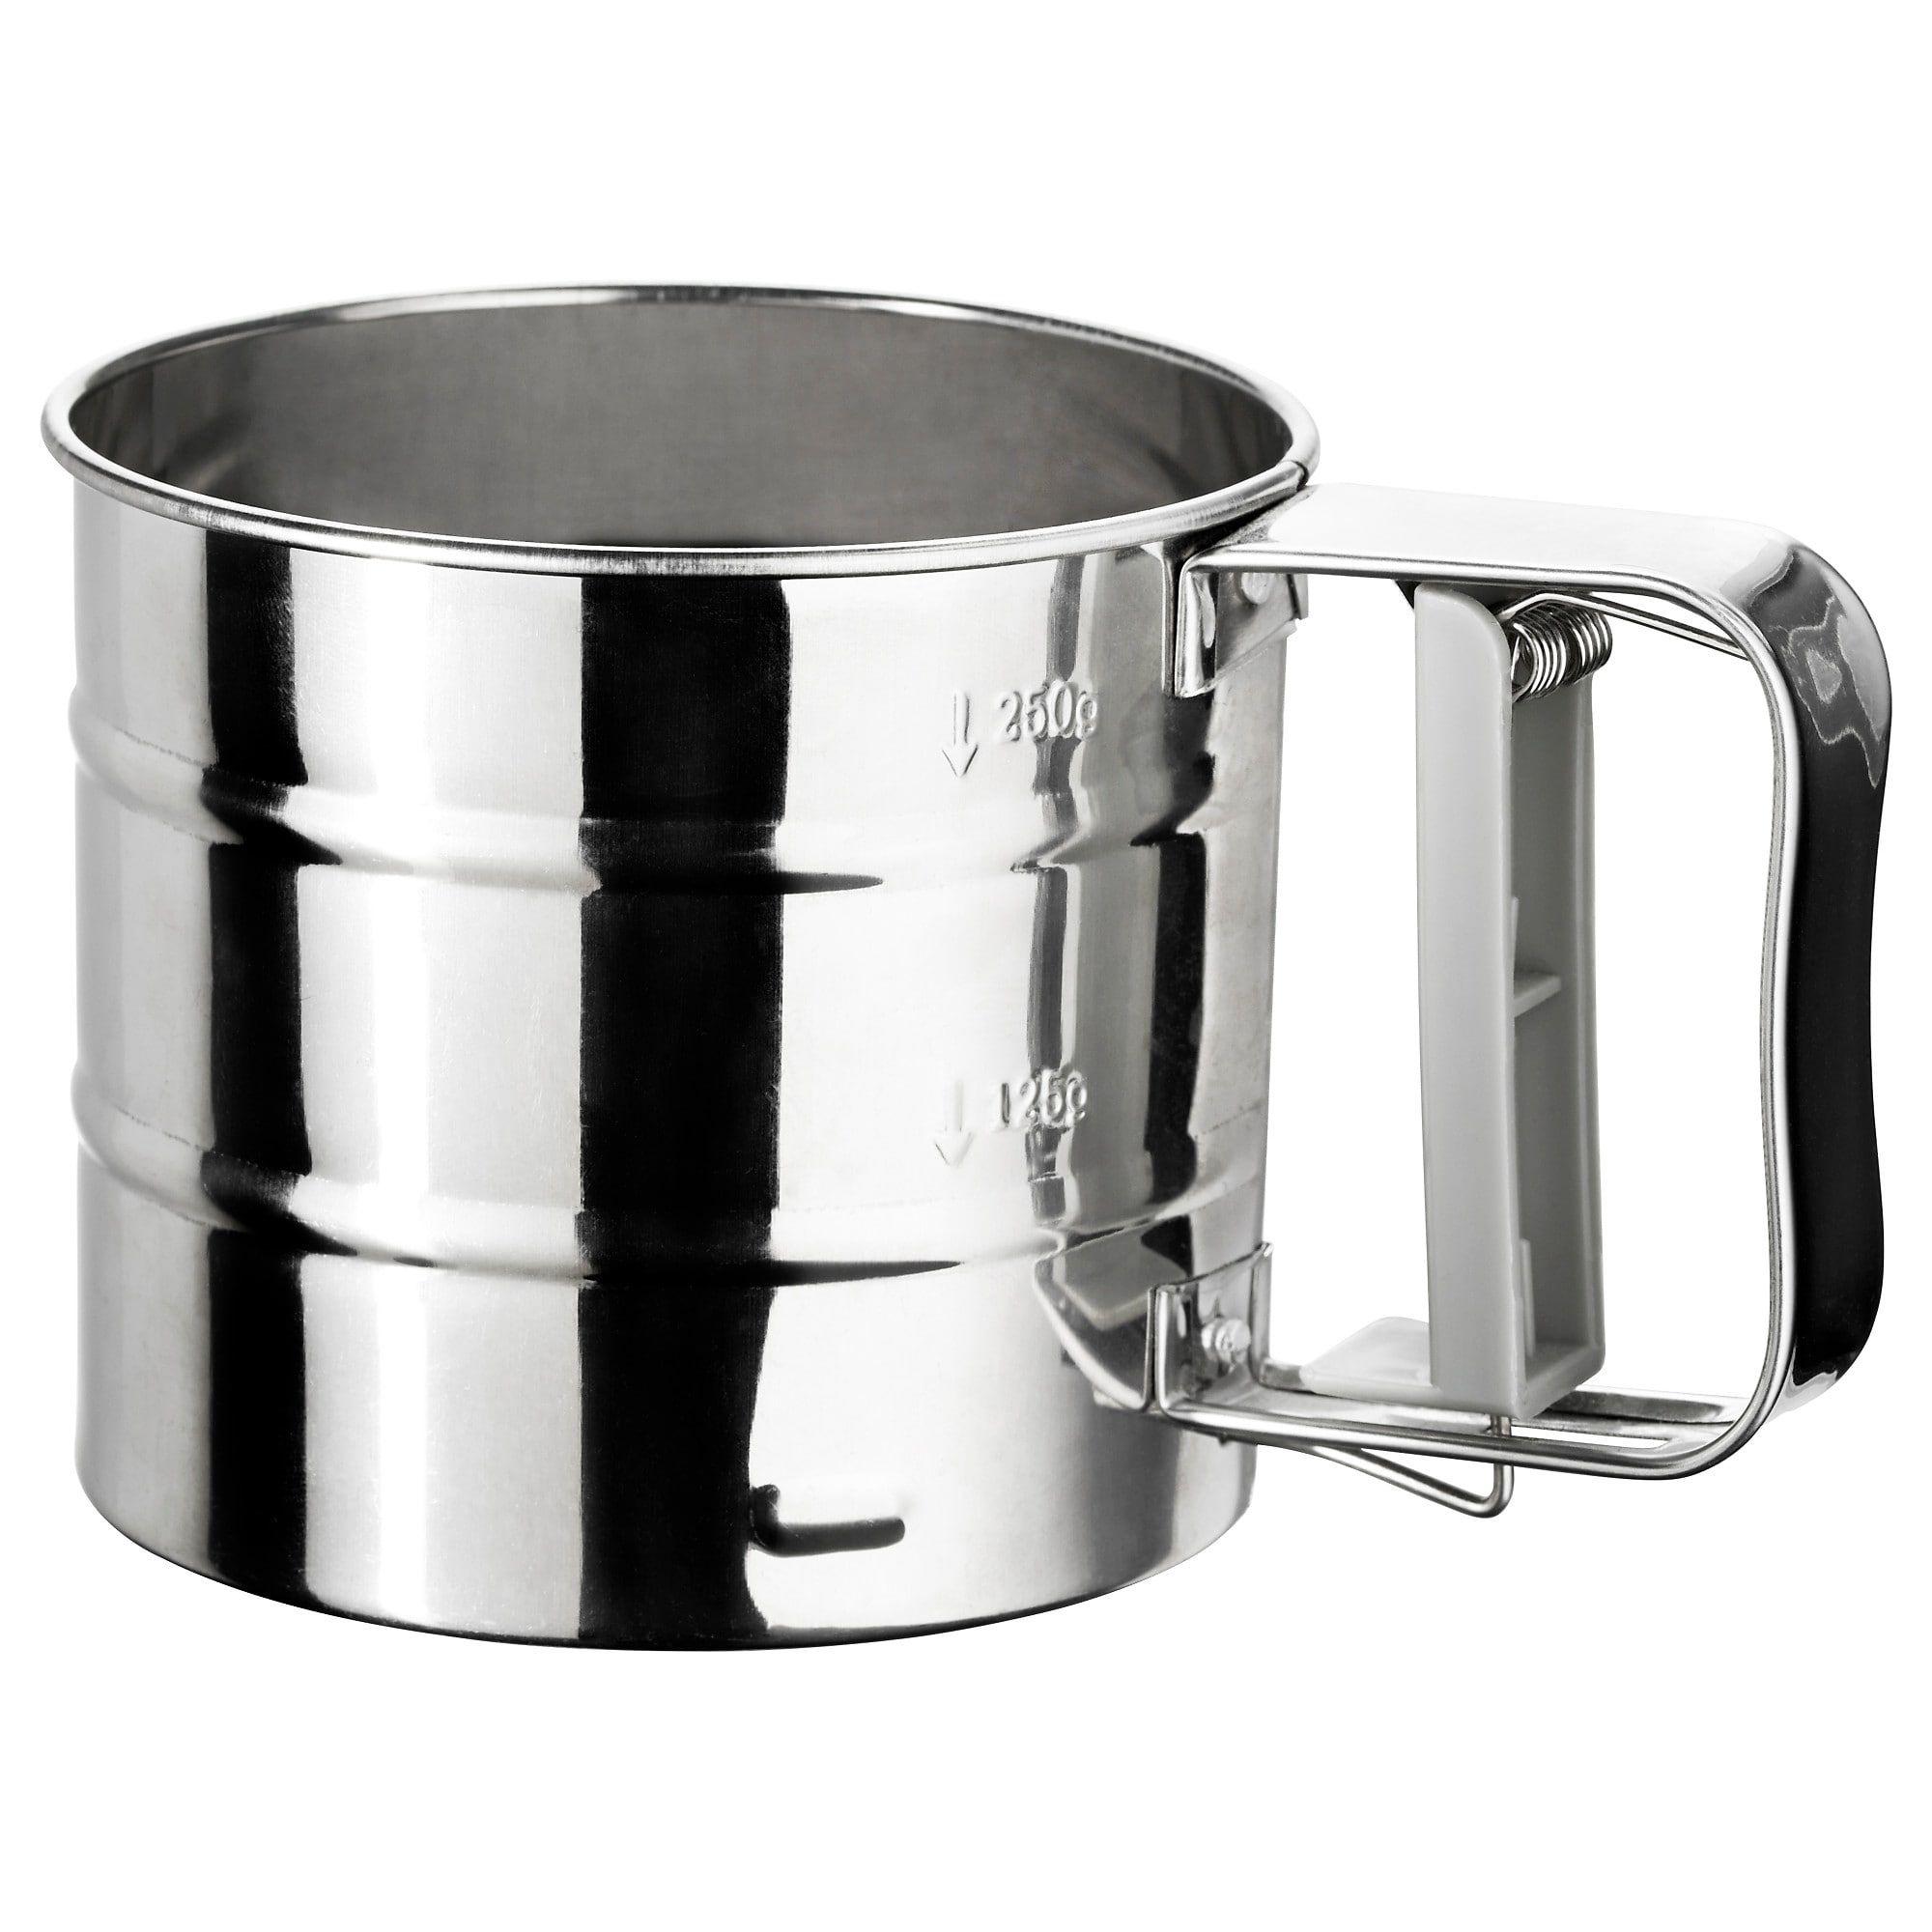 ikea idealisk flour sifter stainless steel kitchen. Black Bedroom Furniture Sets. Home Design Ideas